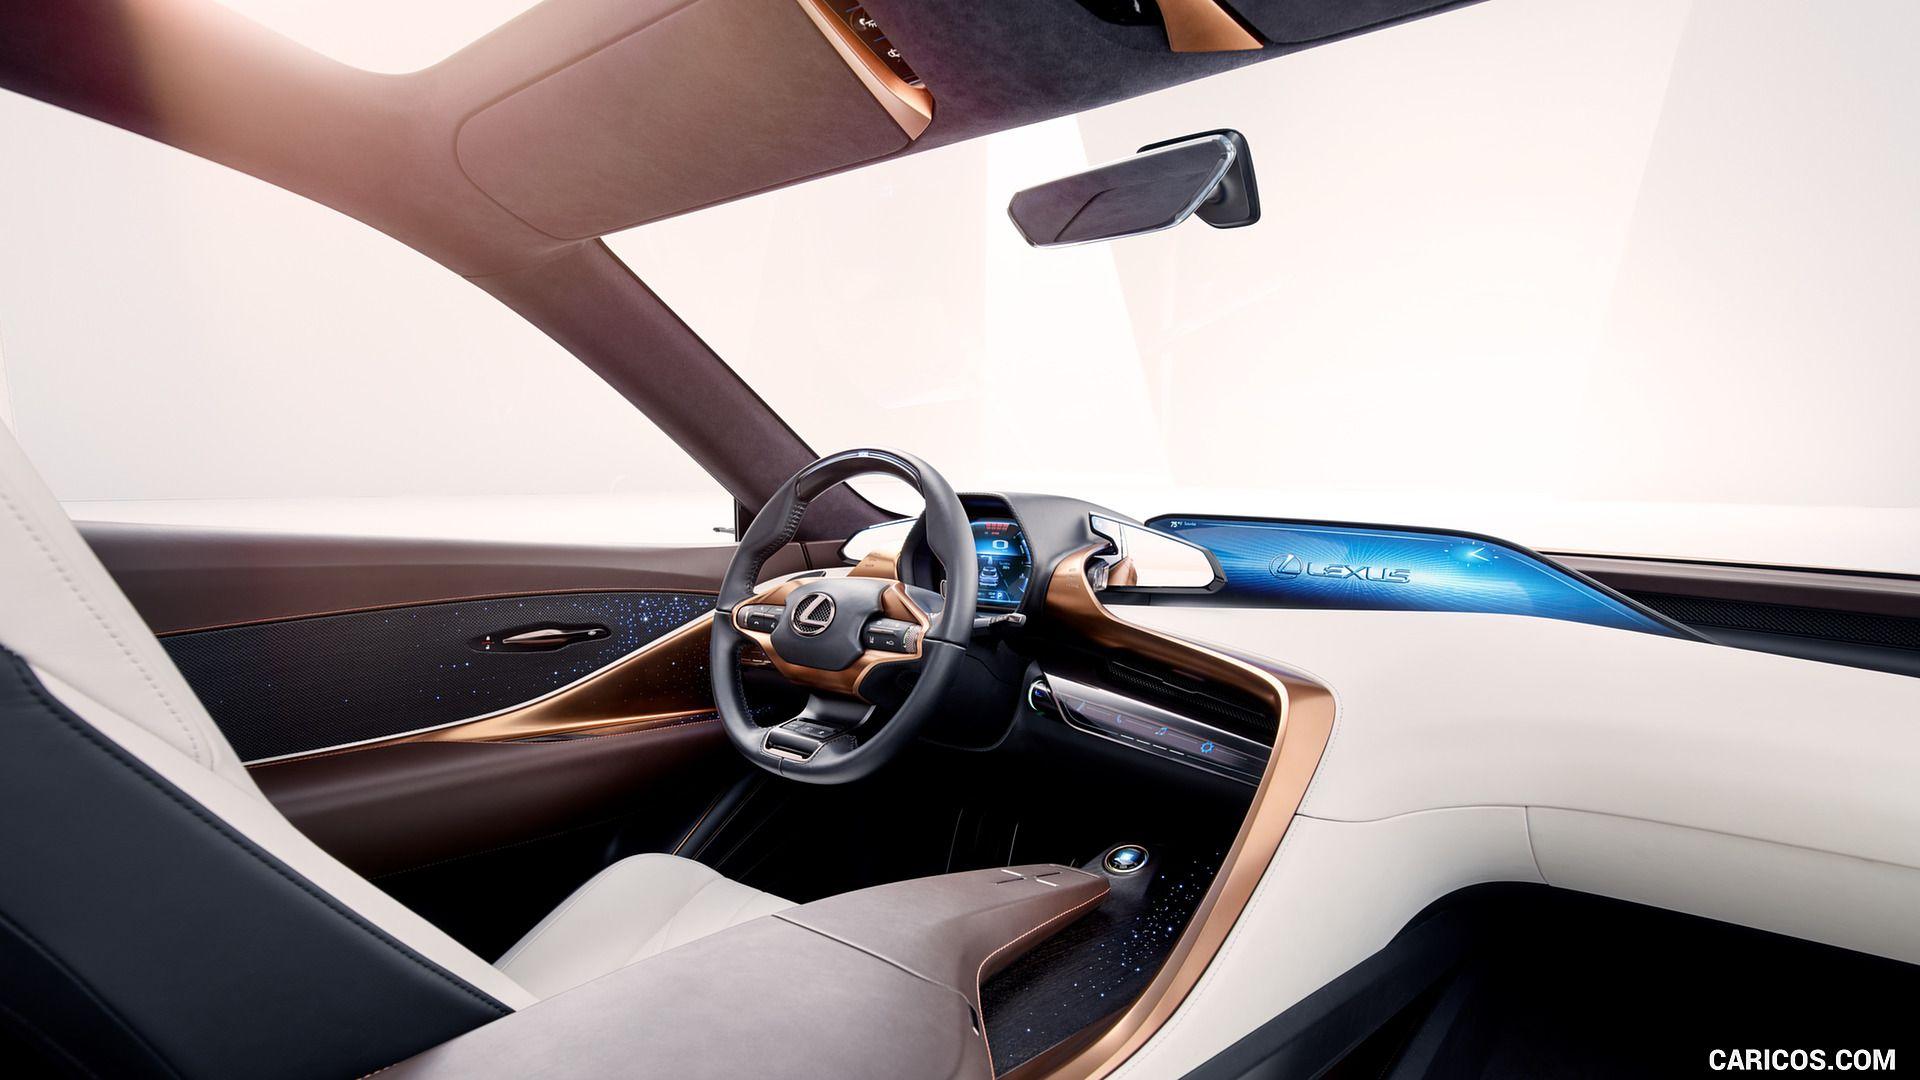 2018 Lexus Lf 1 Limitless Concept Wallpaper Luxury Suv Luxury Crossovers Lexus